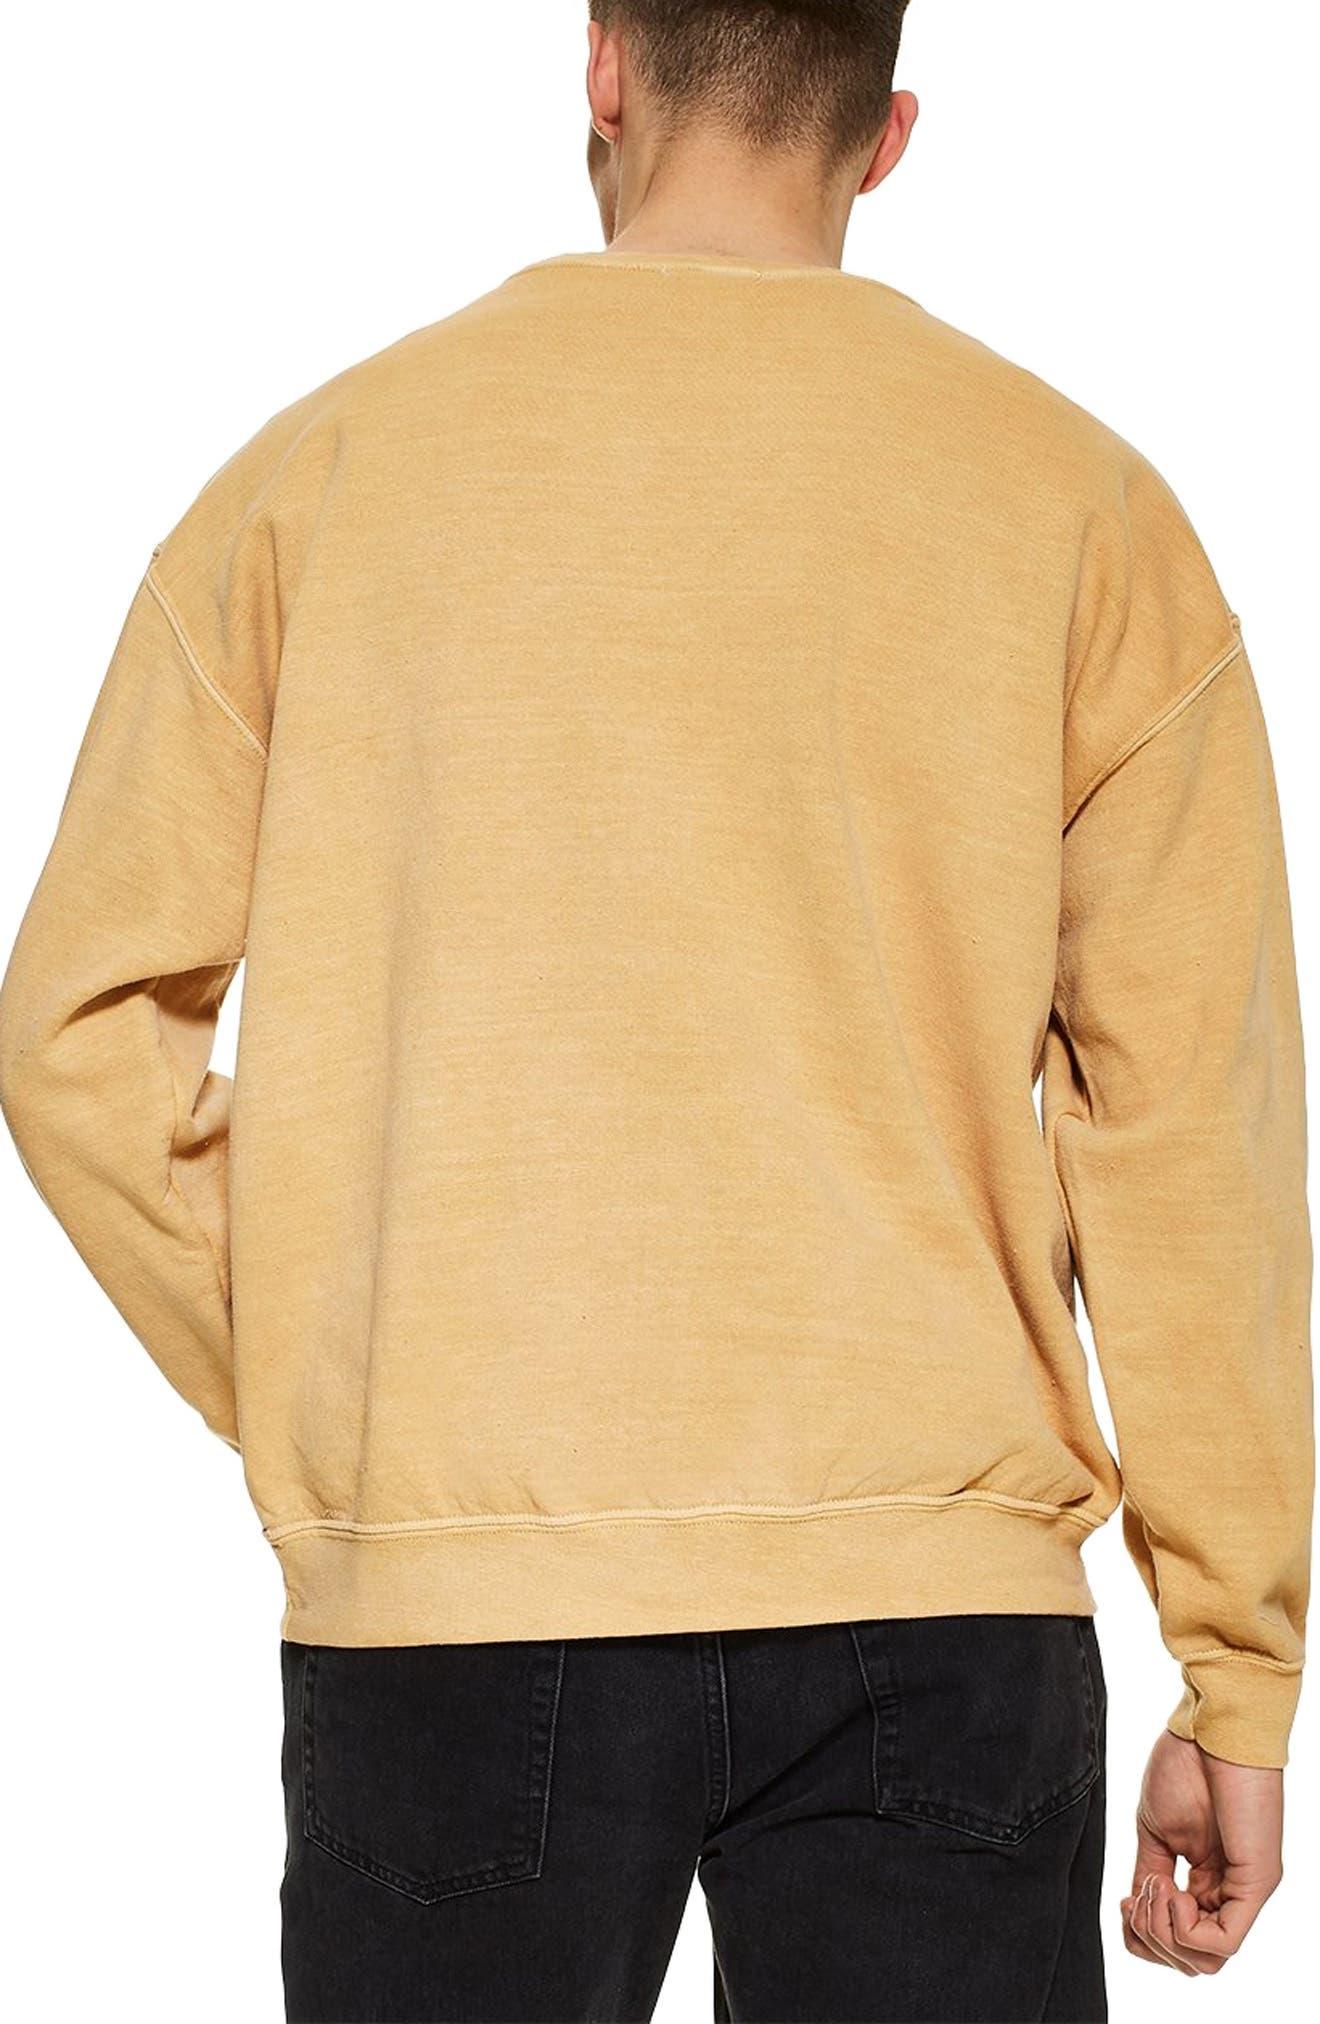 TOPMAN, Stockholm Sweatshirt, Alternate thumbnail 2, color, YELLOW